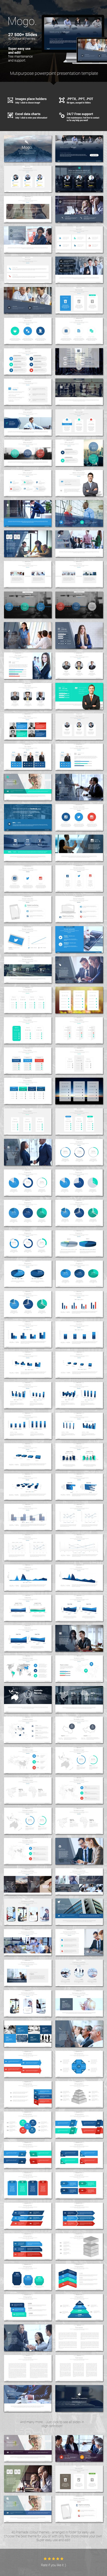 Mogo Powerpoint Presentation Template